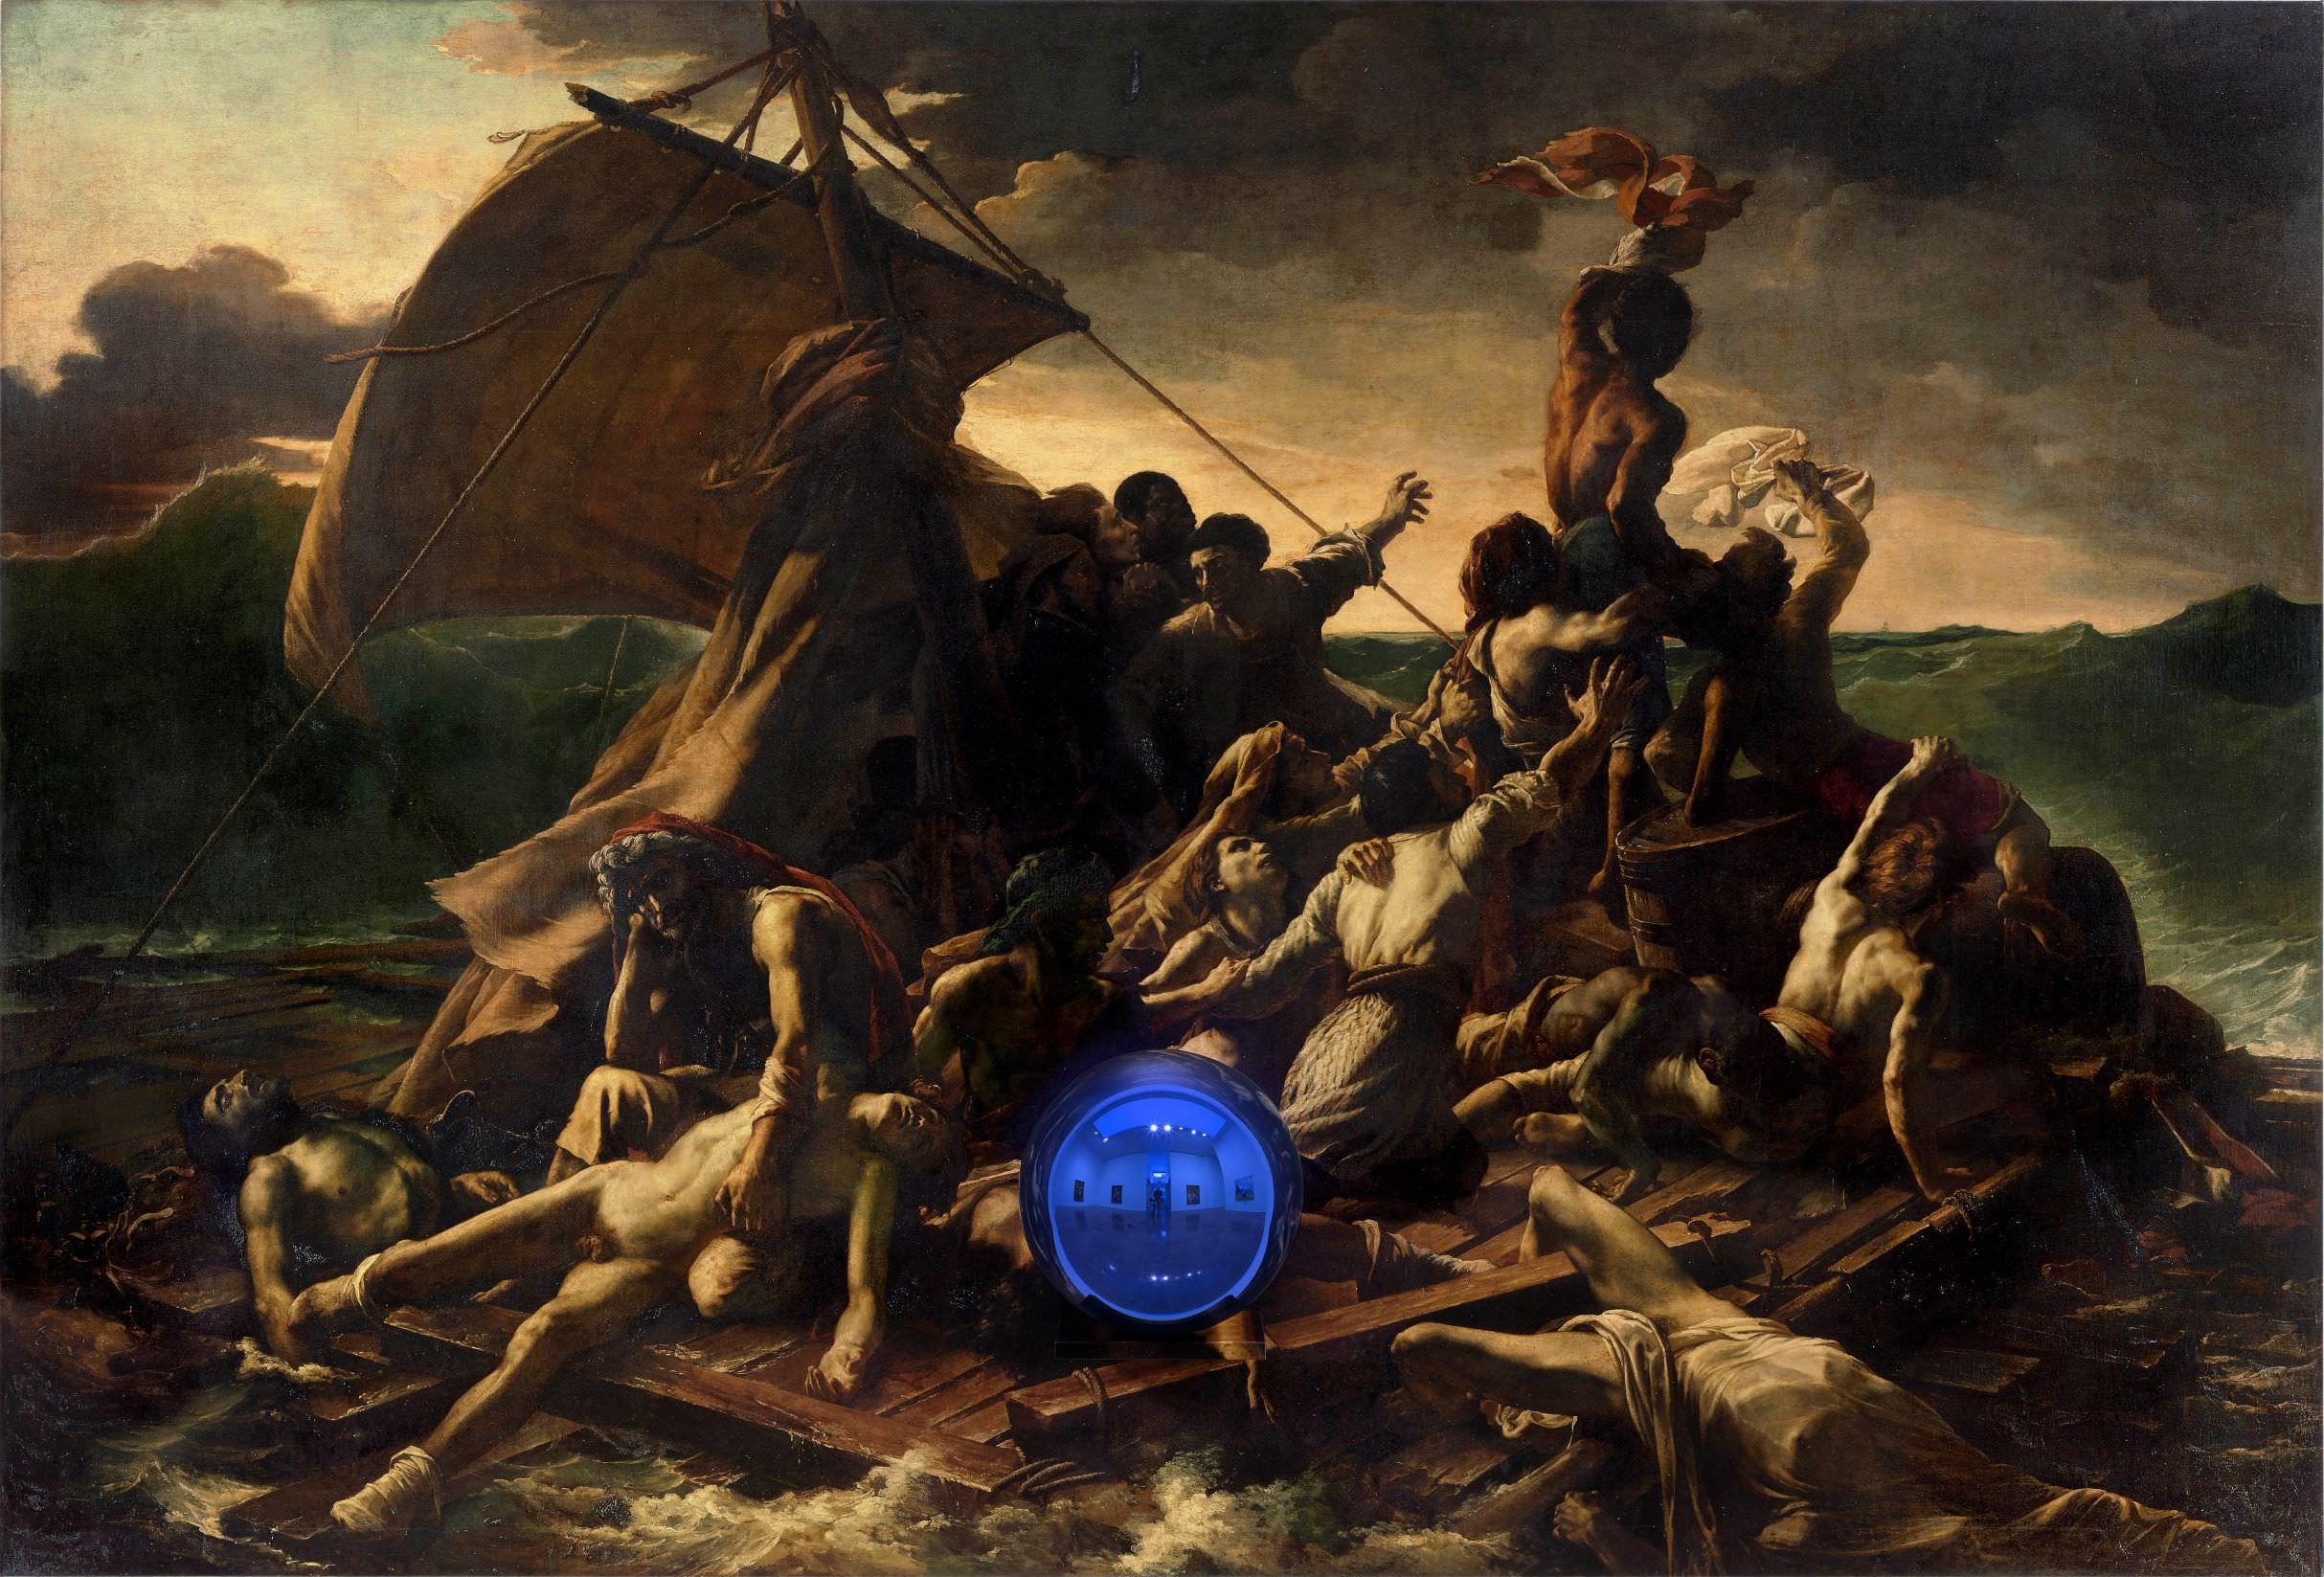 Jeff Koons (b. 1955); Gazing Ball (Gericault Raft of the Medusa); 2014–15; Oil on canvas, glass, and aluminium; 175.9 x 259.1 x 37.5 cm; Collection of the artist © Jeff Koons. Photo: Tom Powel Imaging. Courtesy Gagosian